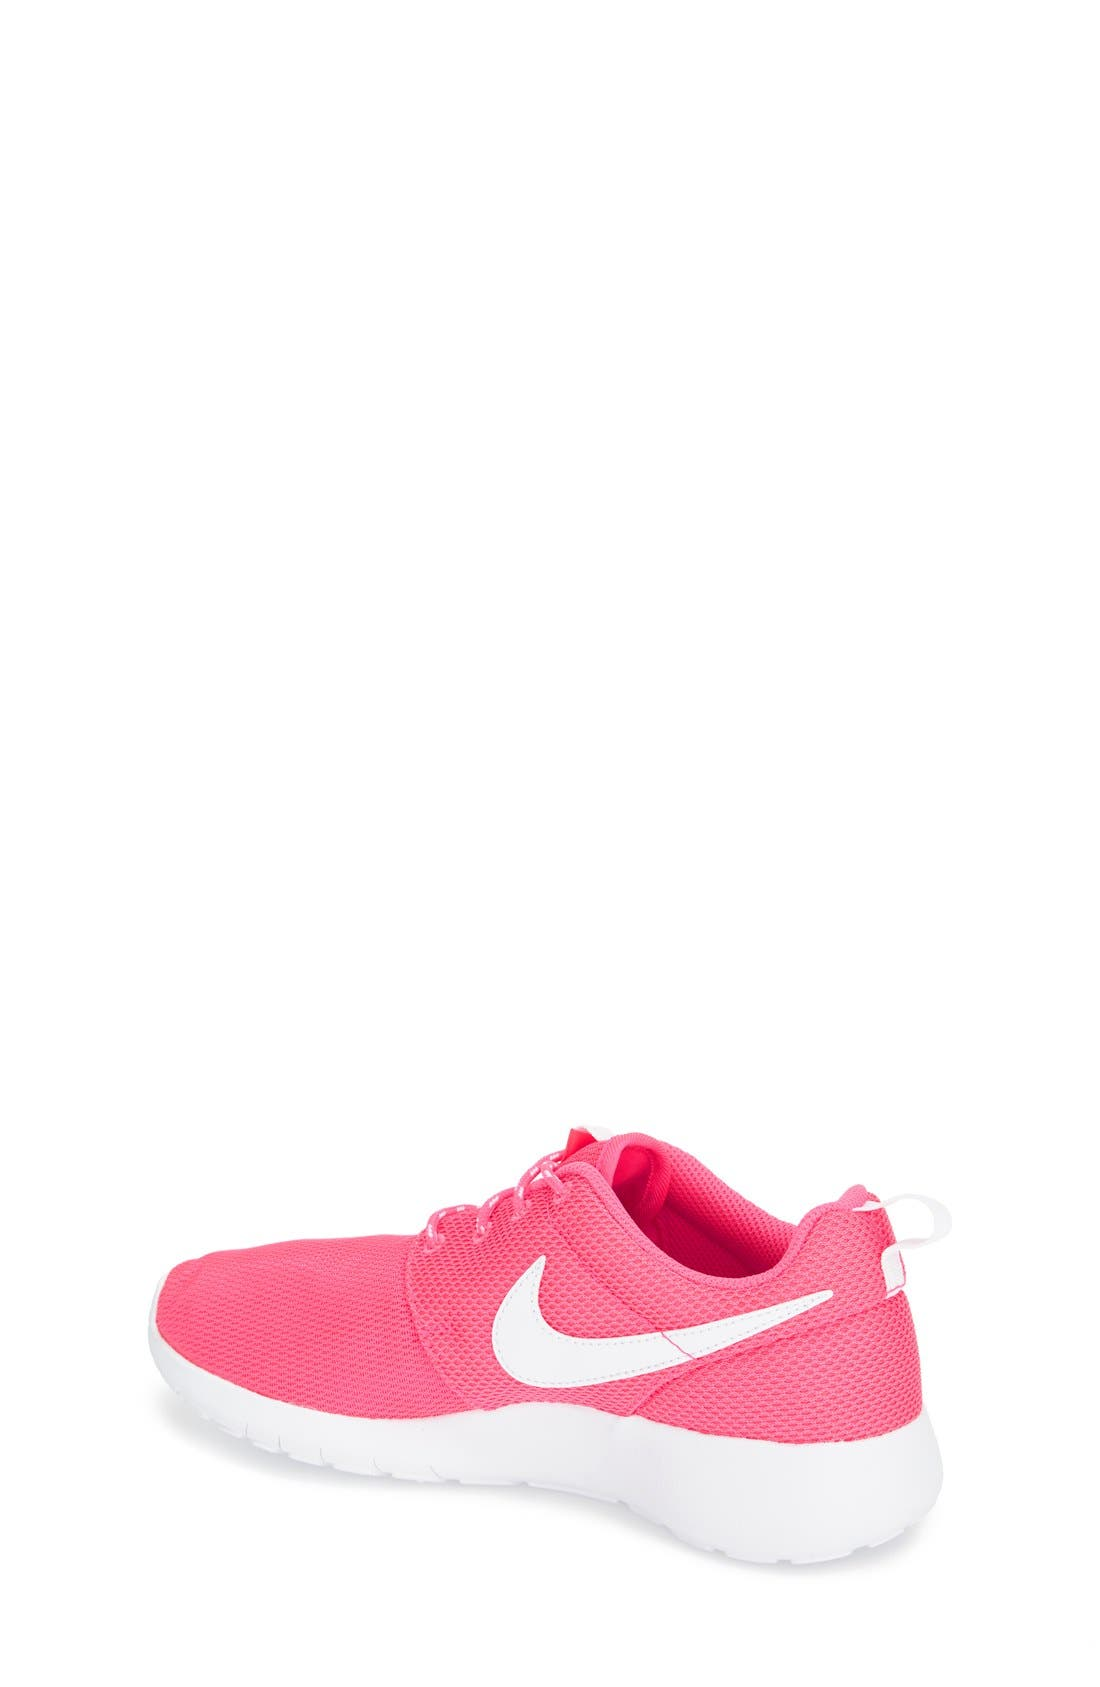 Alternate Image 4  - Nike 'Roshe Run' Athletic Shoe (Little Kid & Big Kid)